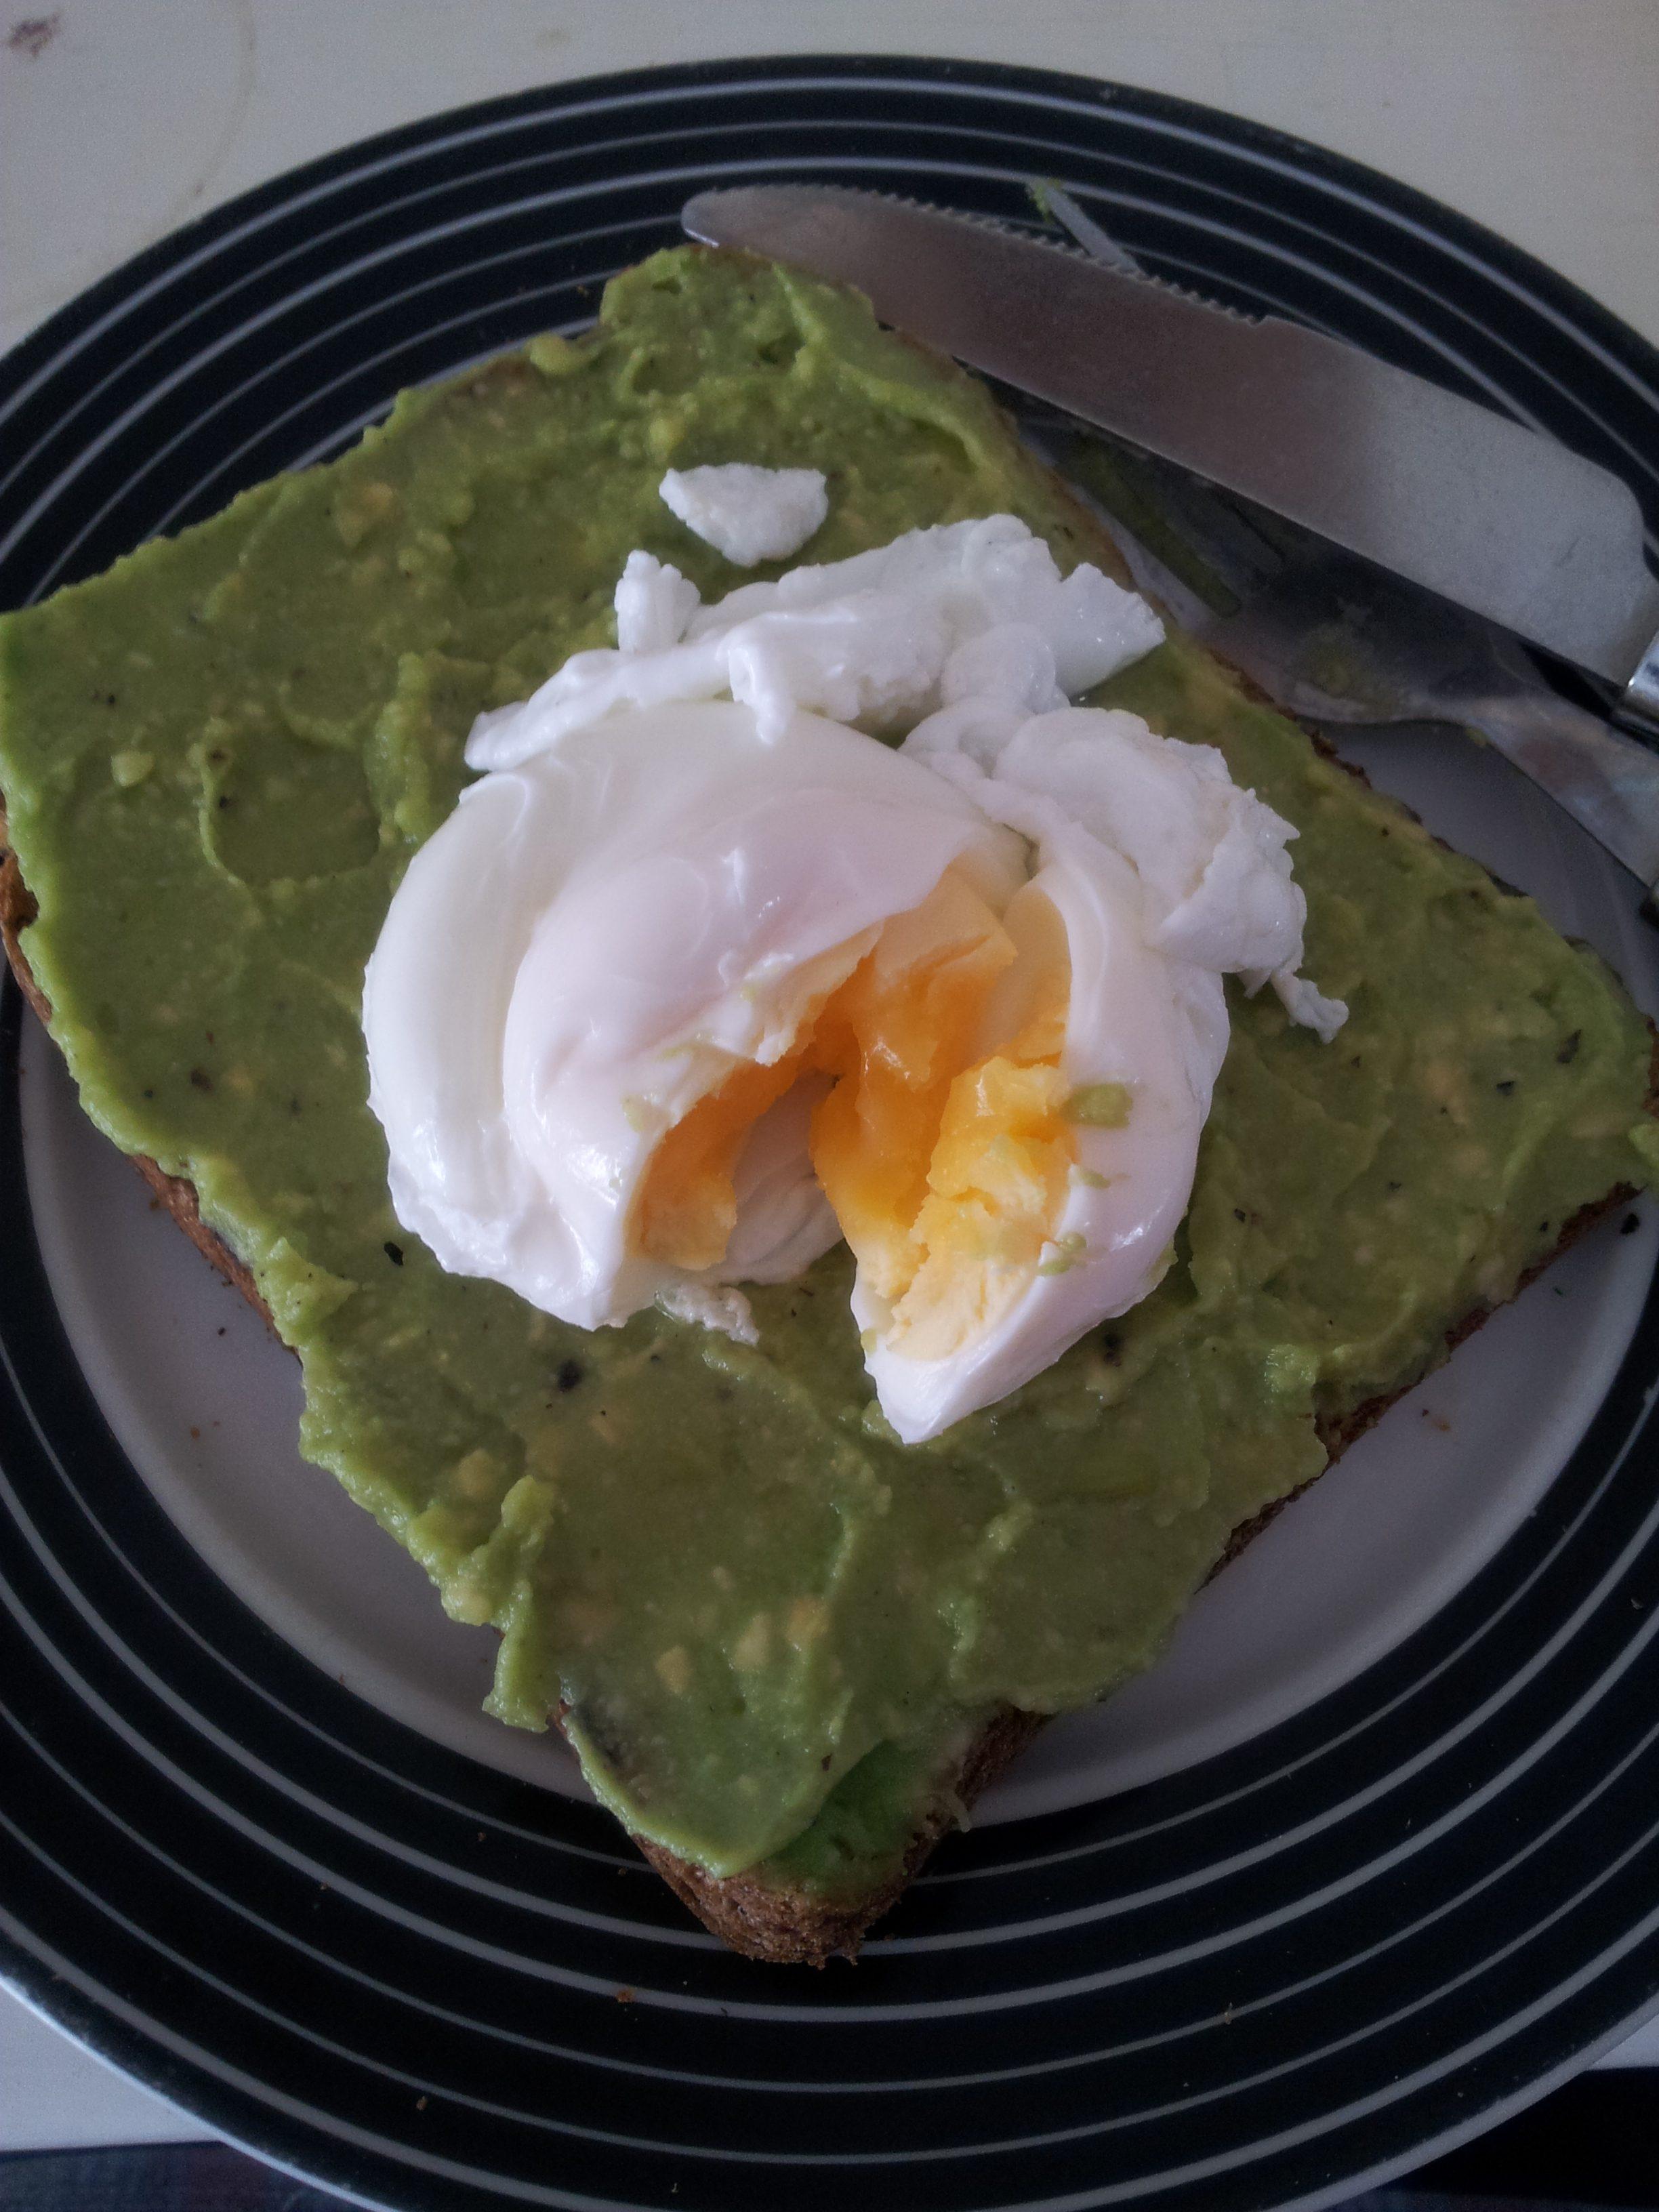 Poached egg on avocado toast